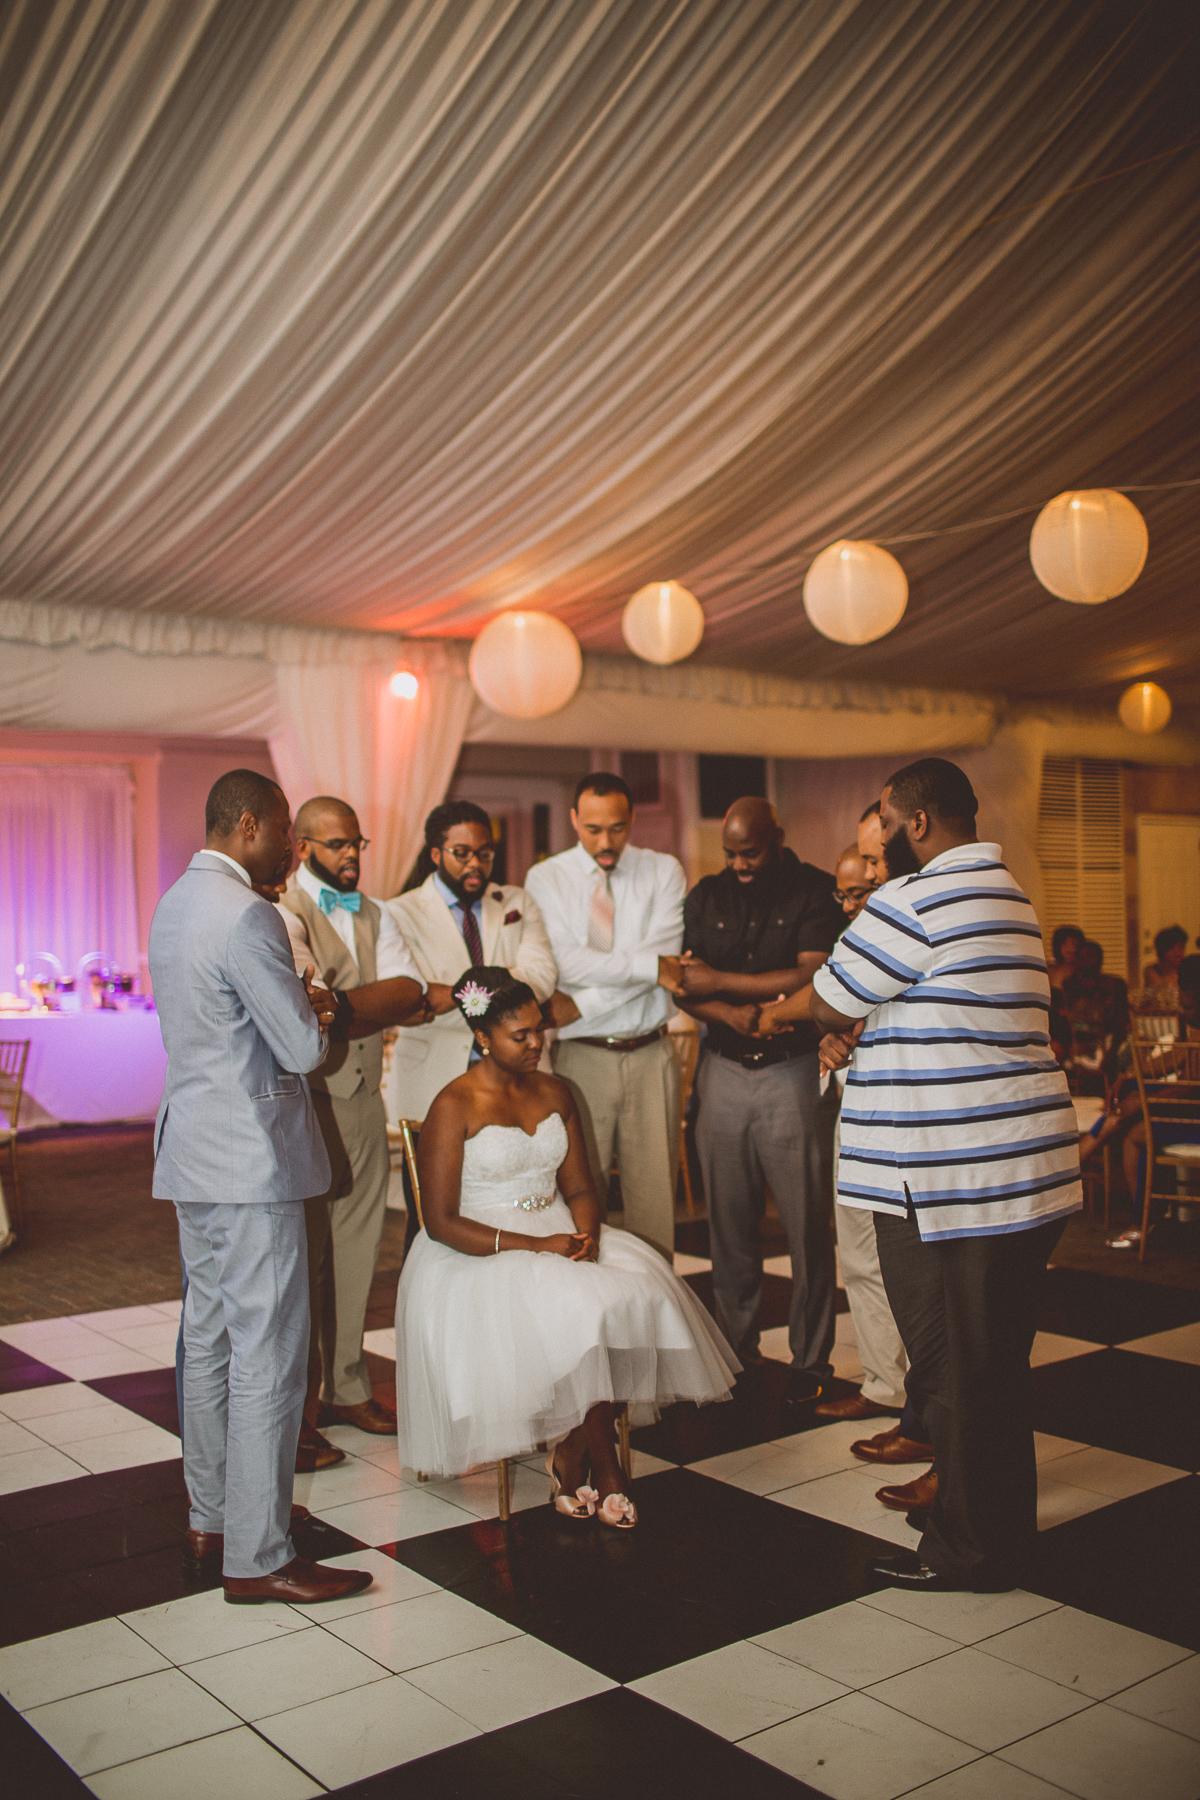 cameron-camaro-kelley-raye-atlanta-wedding-photographer-126.jpg